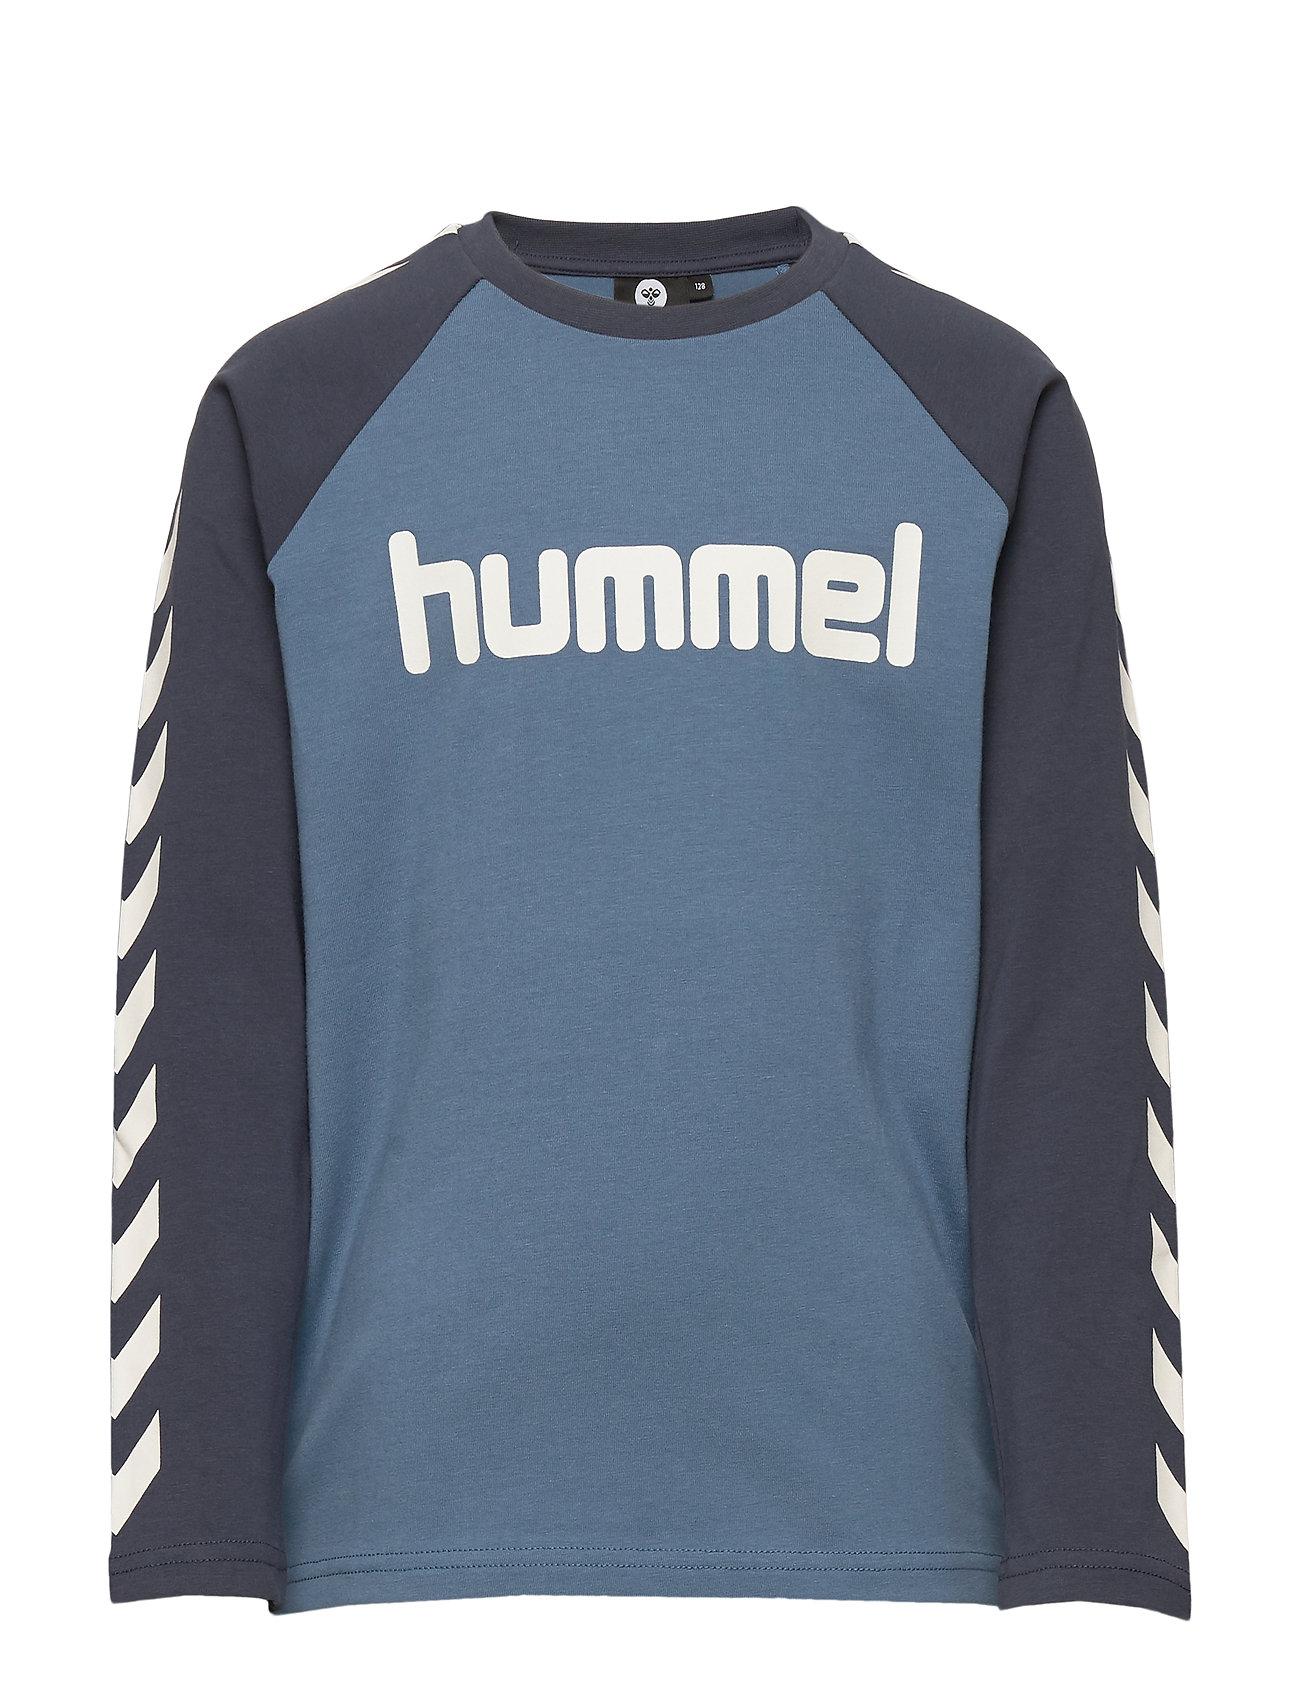 Hummel hmlBOYS T-SHIRT L/S - STELLAR